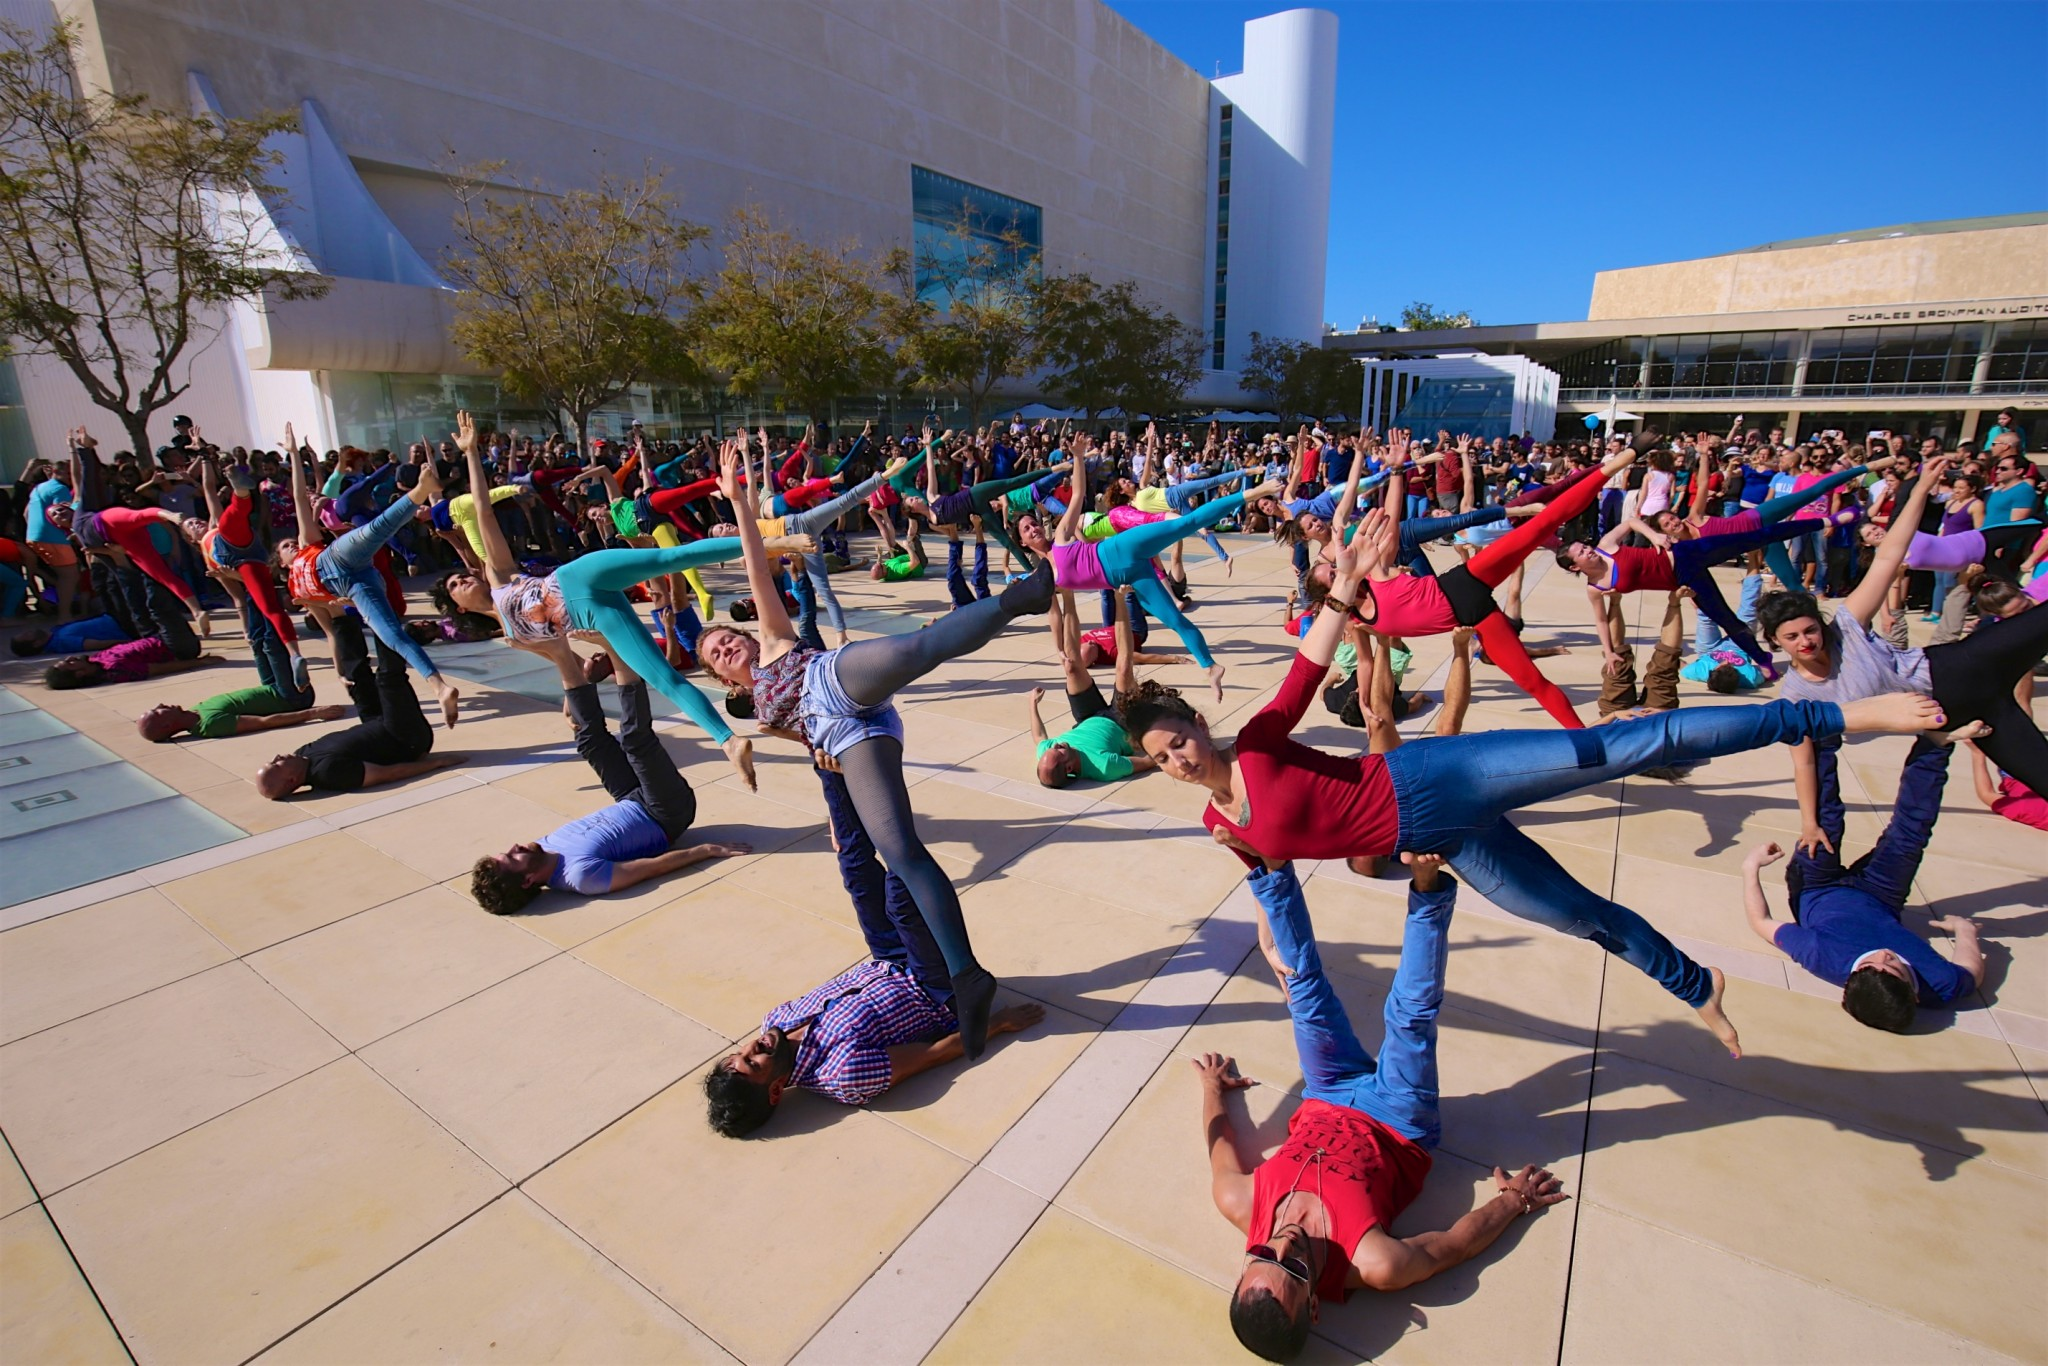 Acro-yoga. Photo by Eyal Bar